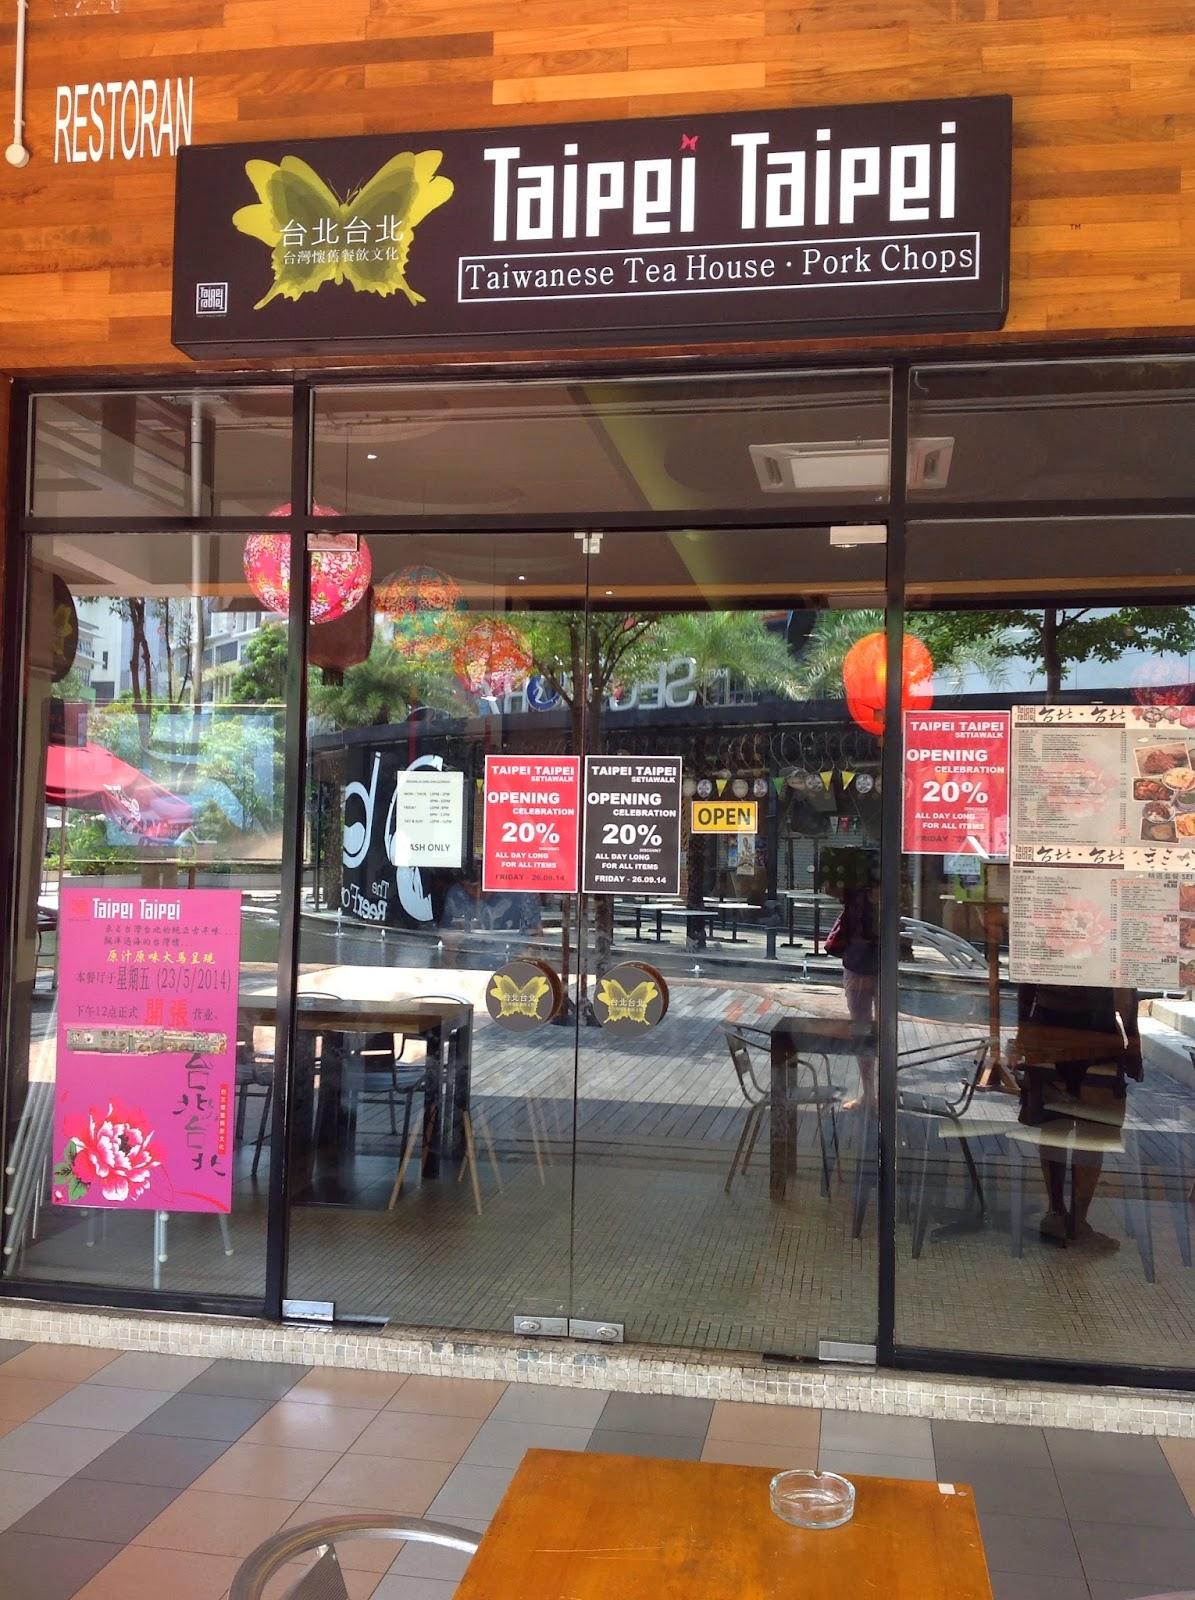 Taipei Taipei Taiwan Restaurant Setiawalk Puchong Secret